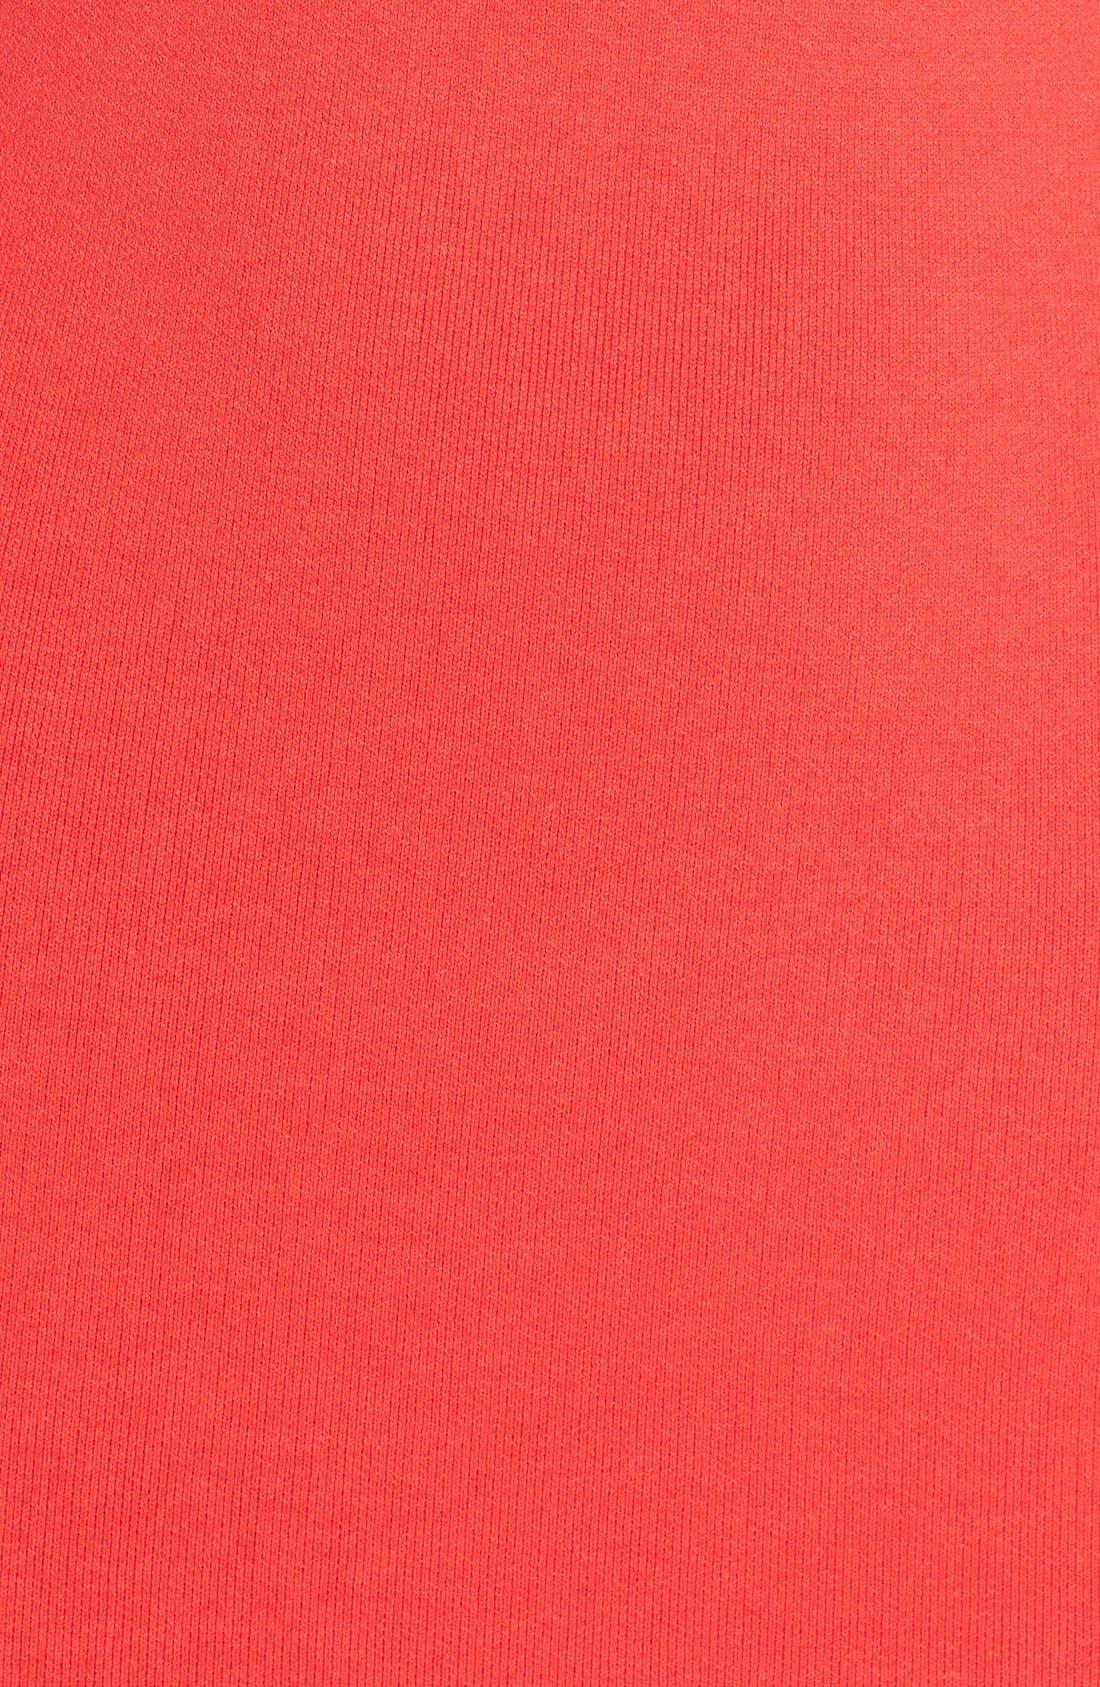 Alternate Image 5  - BCBGMAXAZRIA 'Fyonna' Cutout Sweater Body-Con Dress